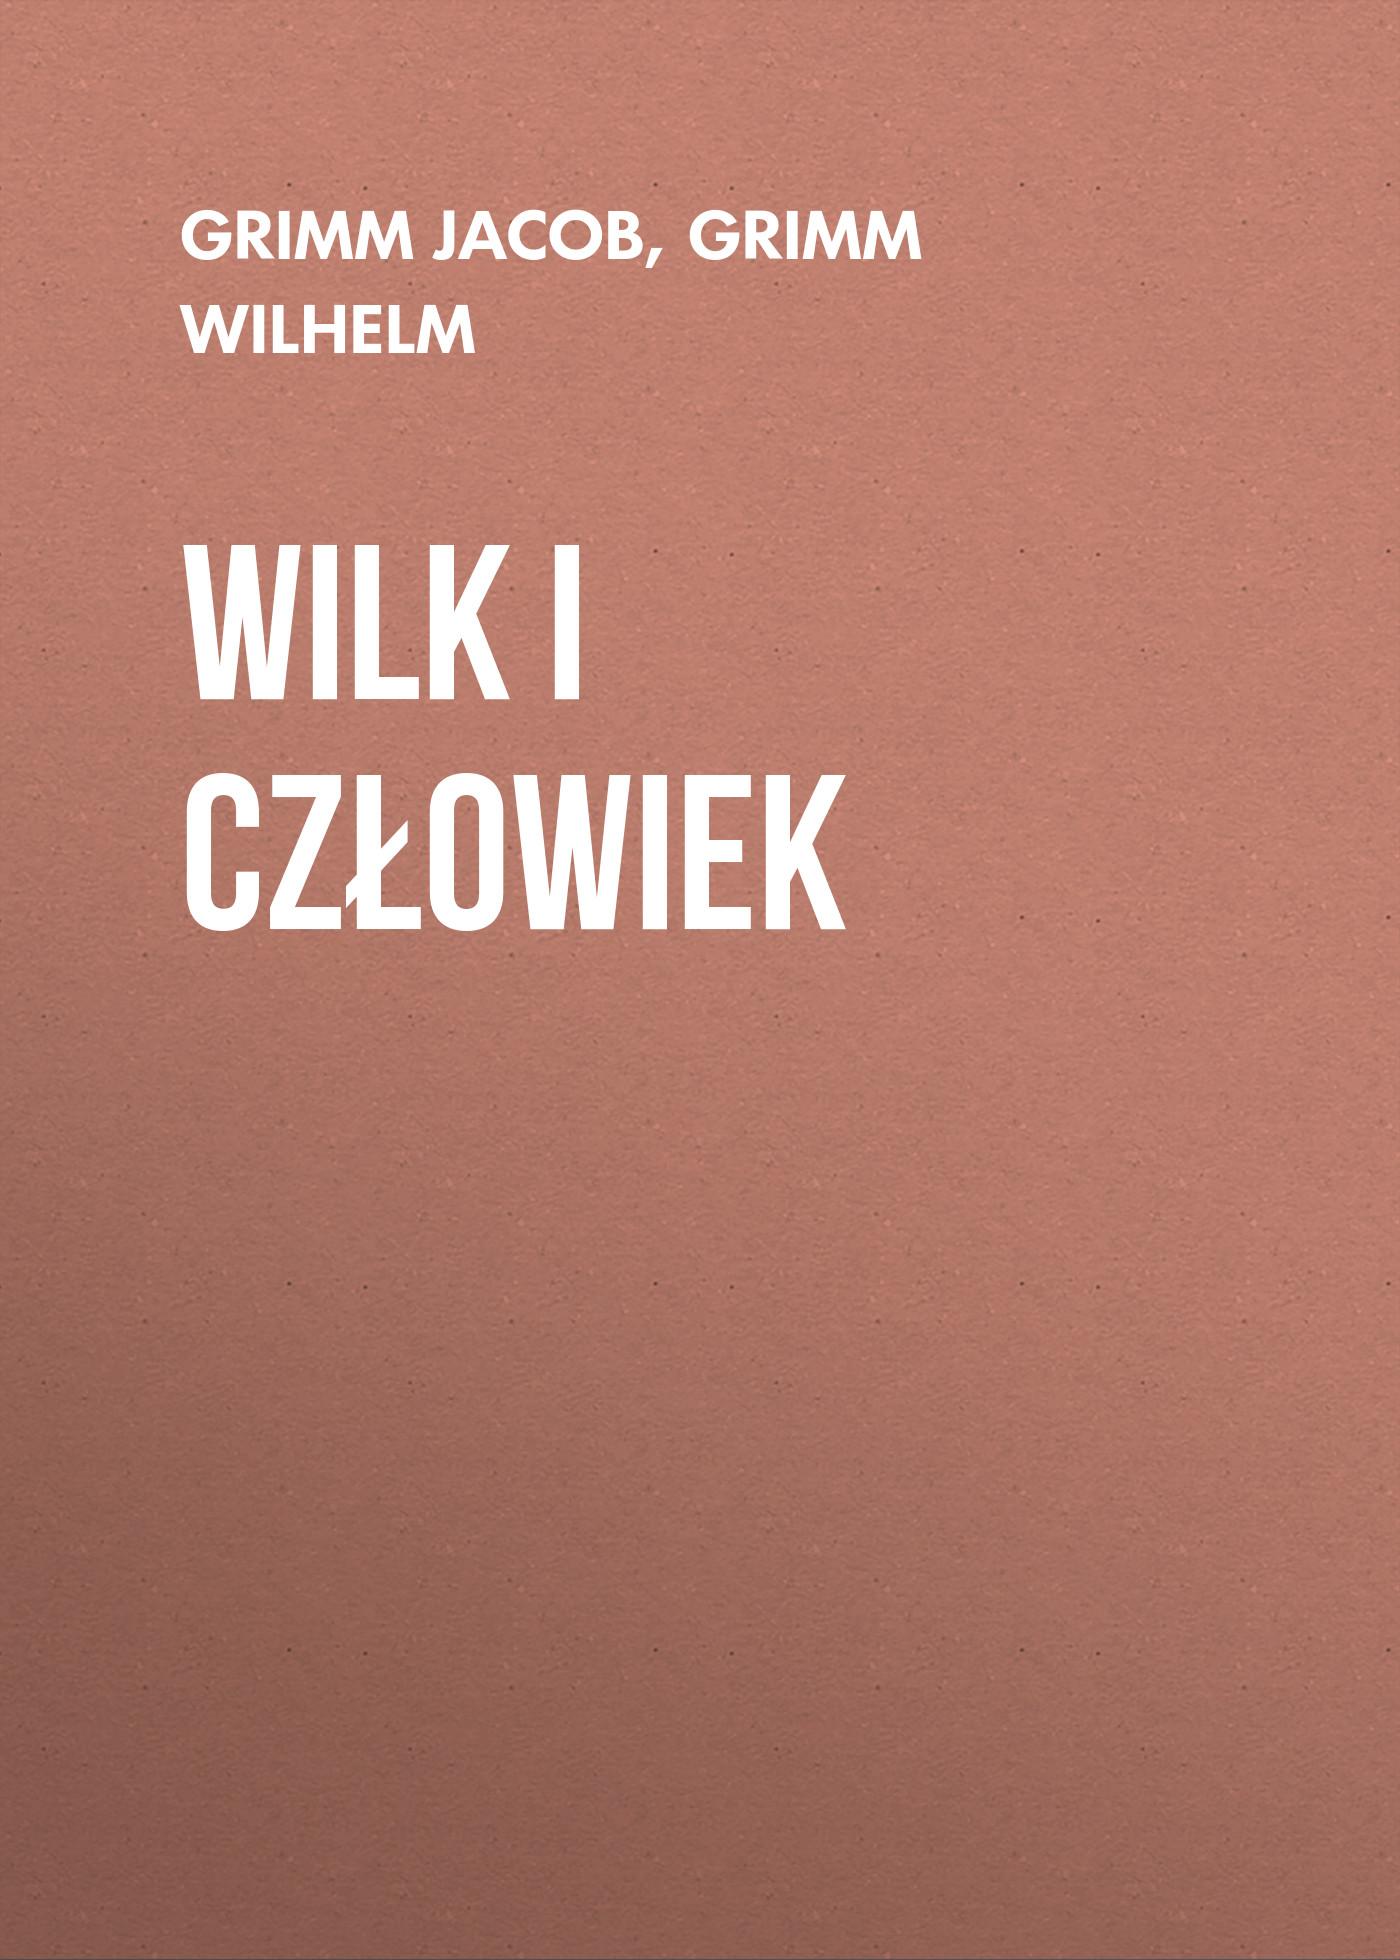 цена на Grimm Jacob Wilk i człowiek